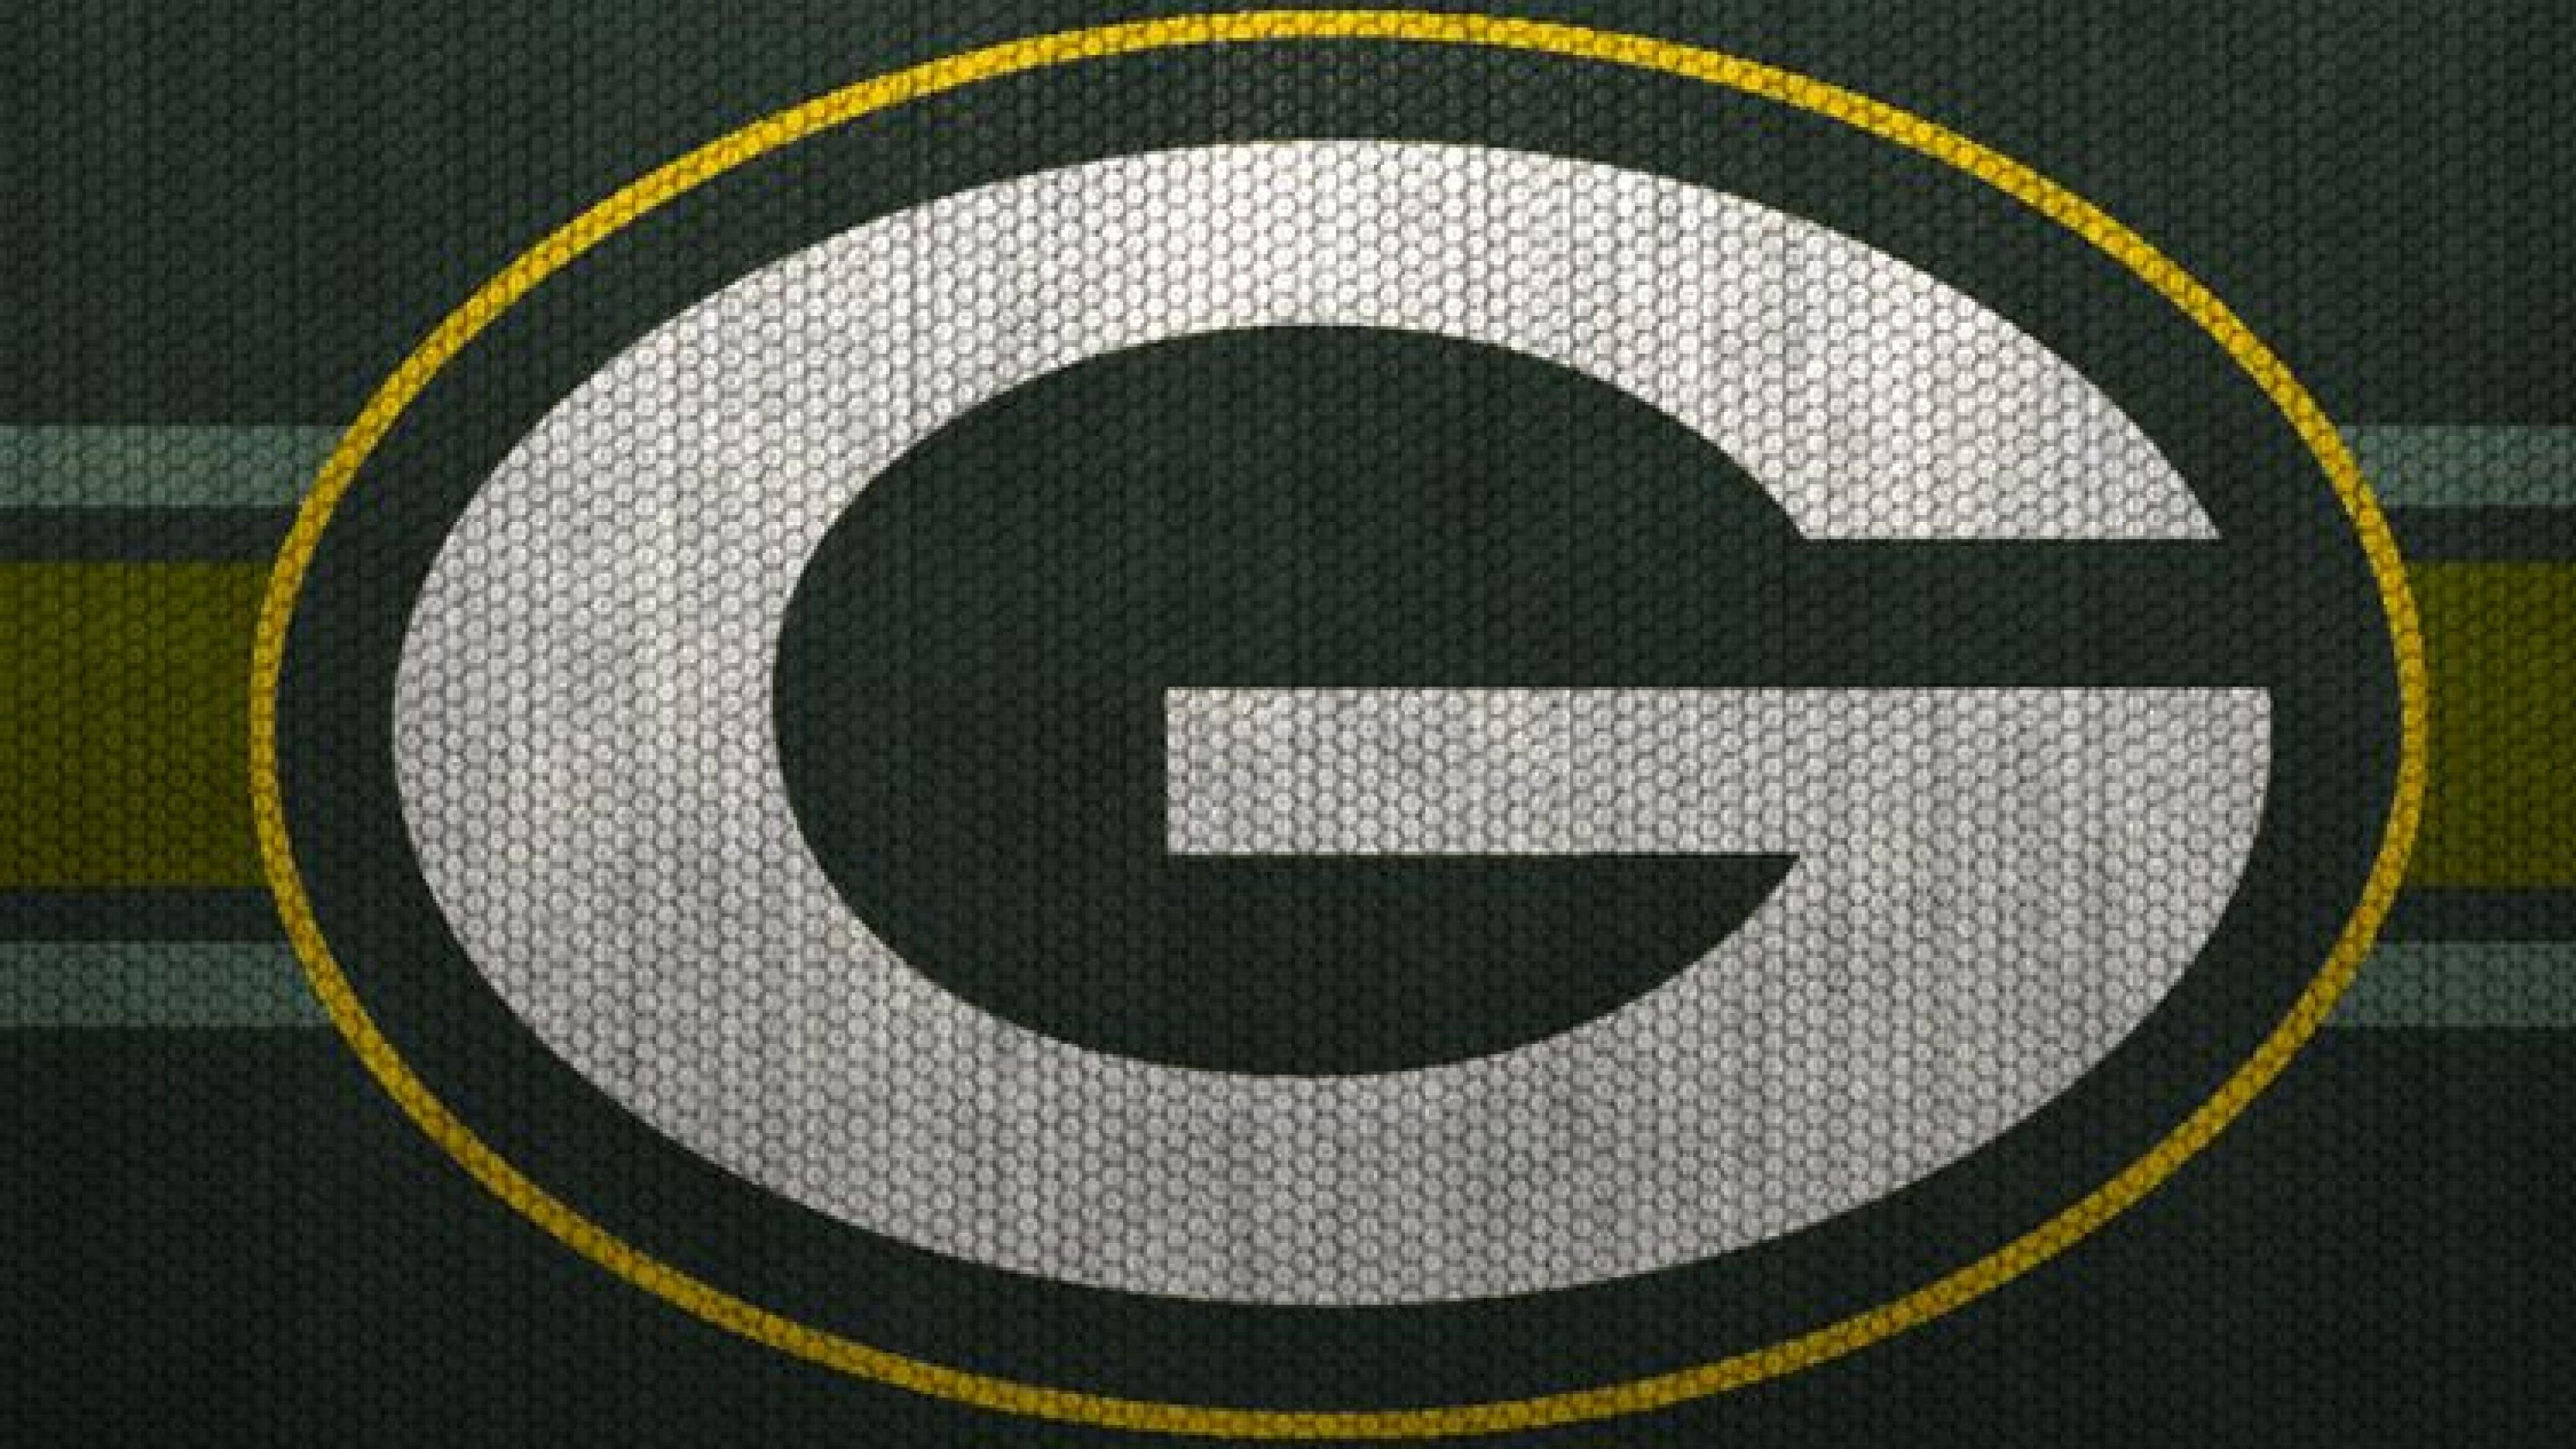 1920x1200 Green Bay Packers Wallpaper